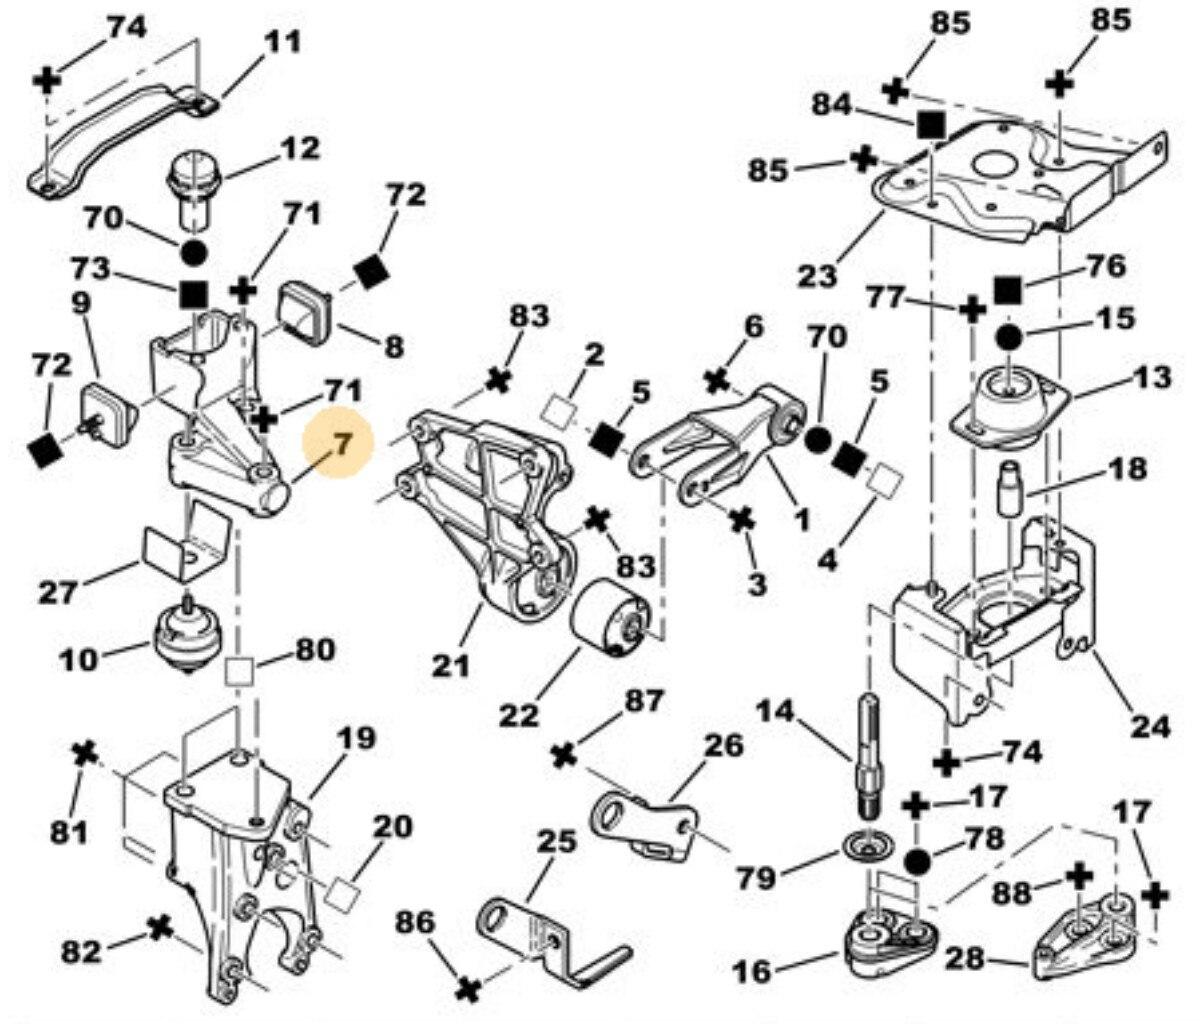 peugeot 206 gti wiring diagram wiring diagram database Dodge Dart Fuse Box Diagram peaugot 206 cc box wiring diagram peugeot 206 turbo peugeot 206 cc wiring diagrams instructions peugeot